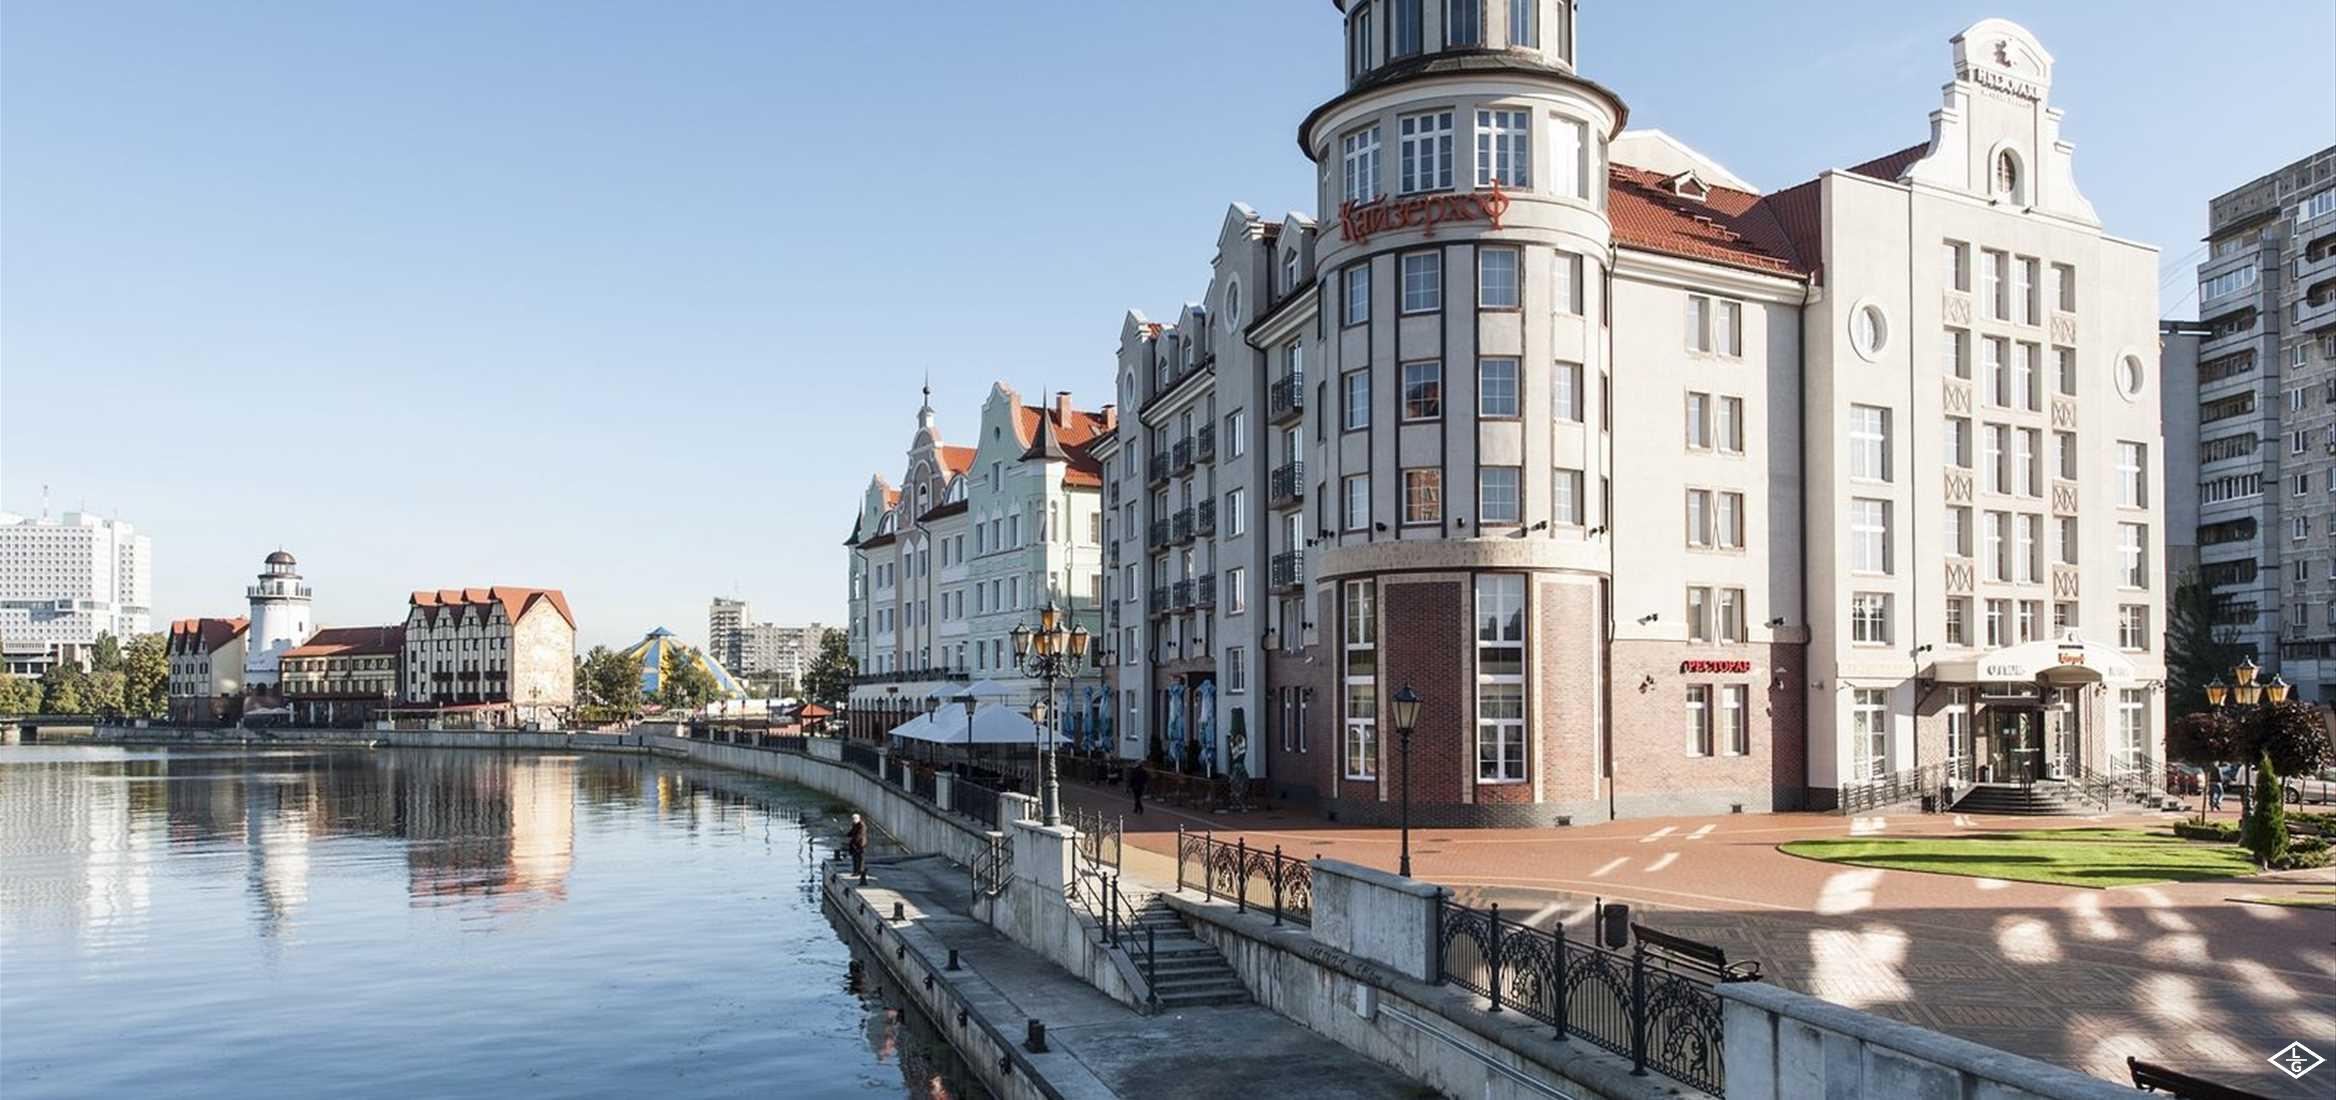 Классификация калининградских гостиниц к ЧМ-2018 завершена